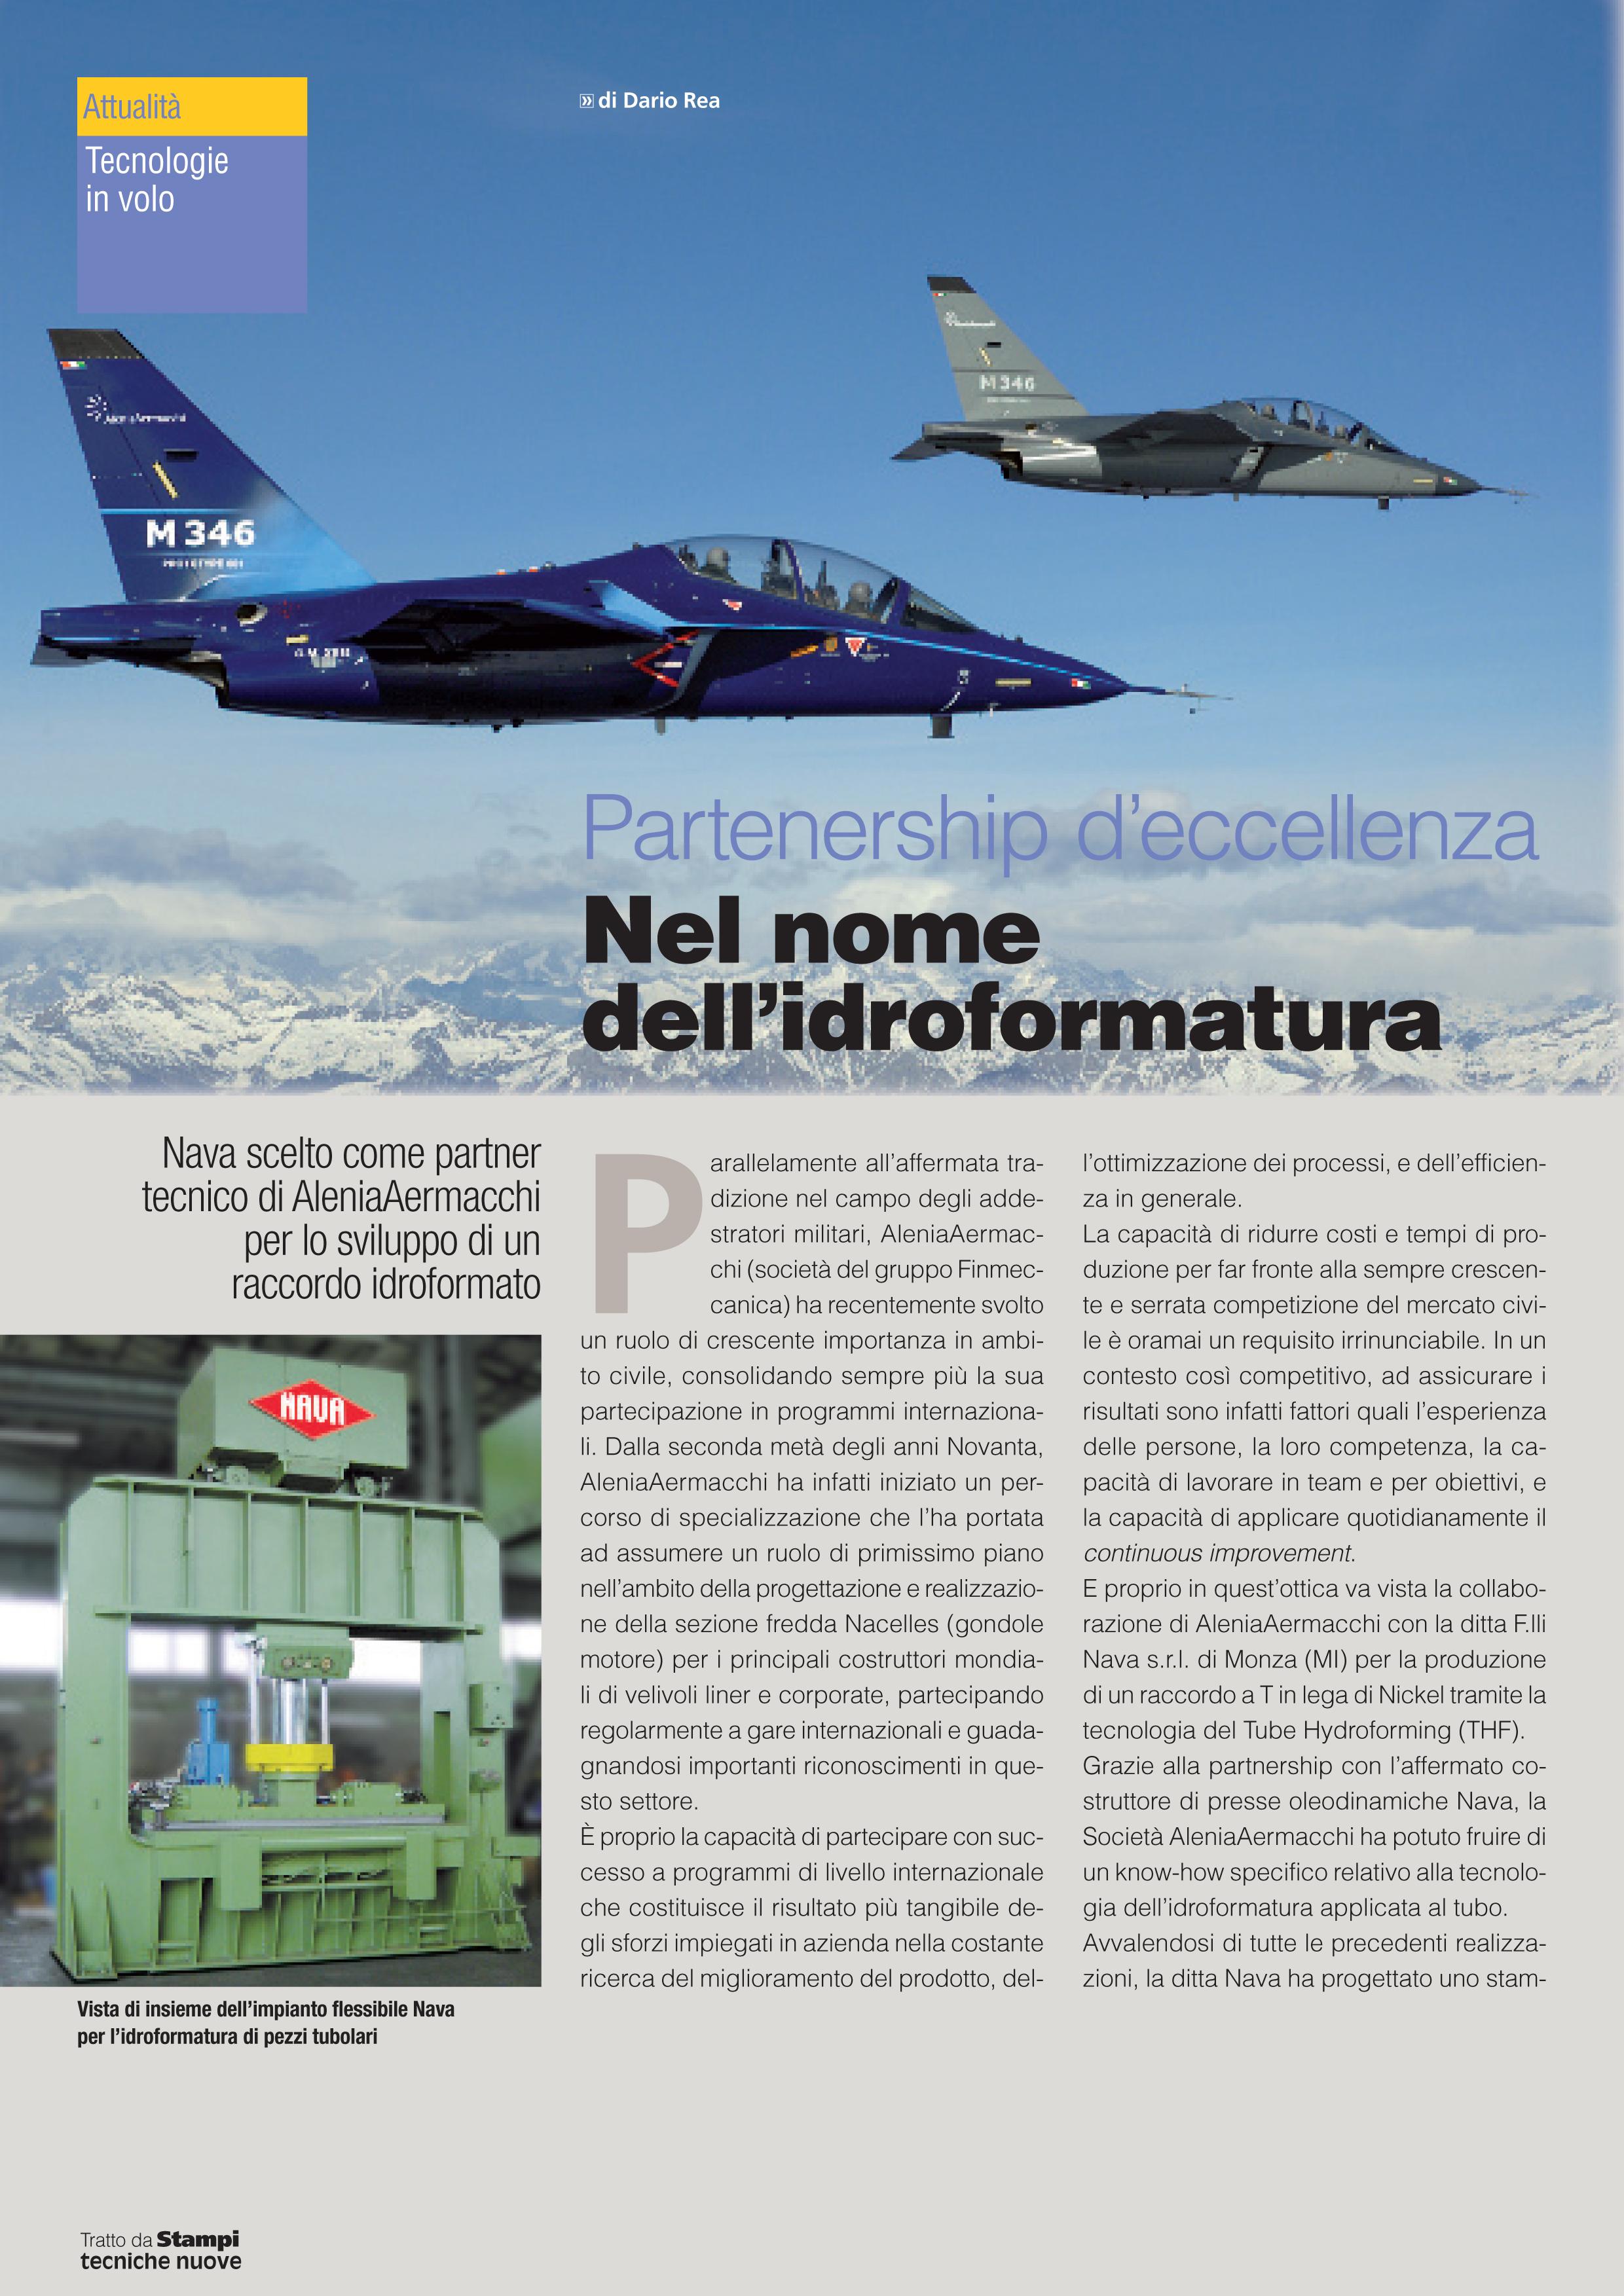 pdf idroformatura